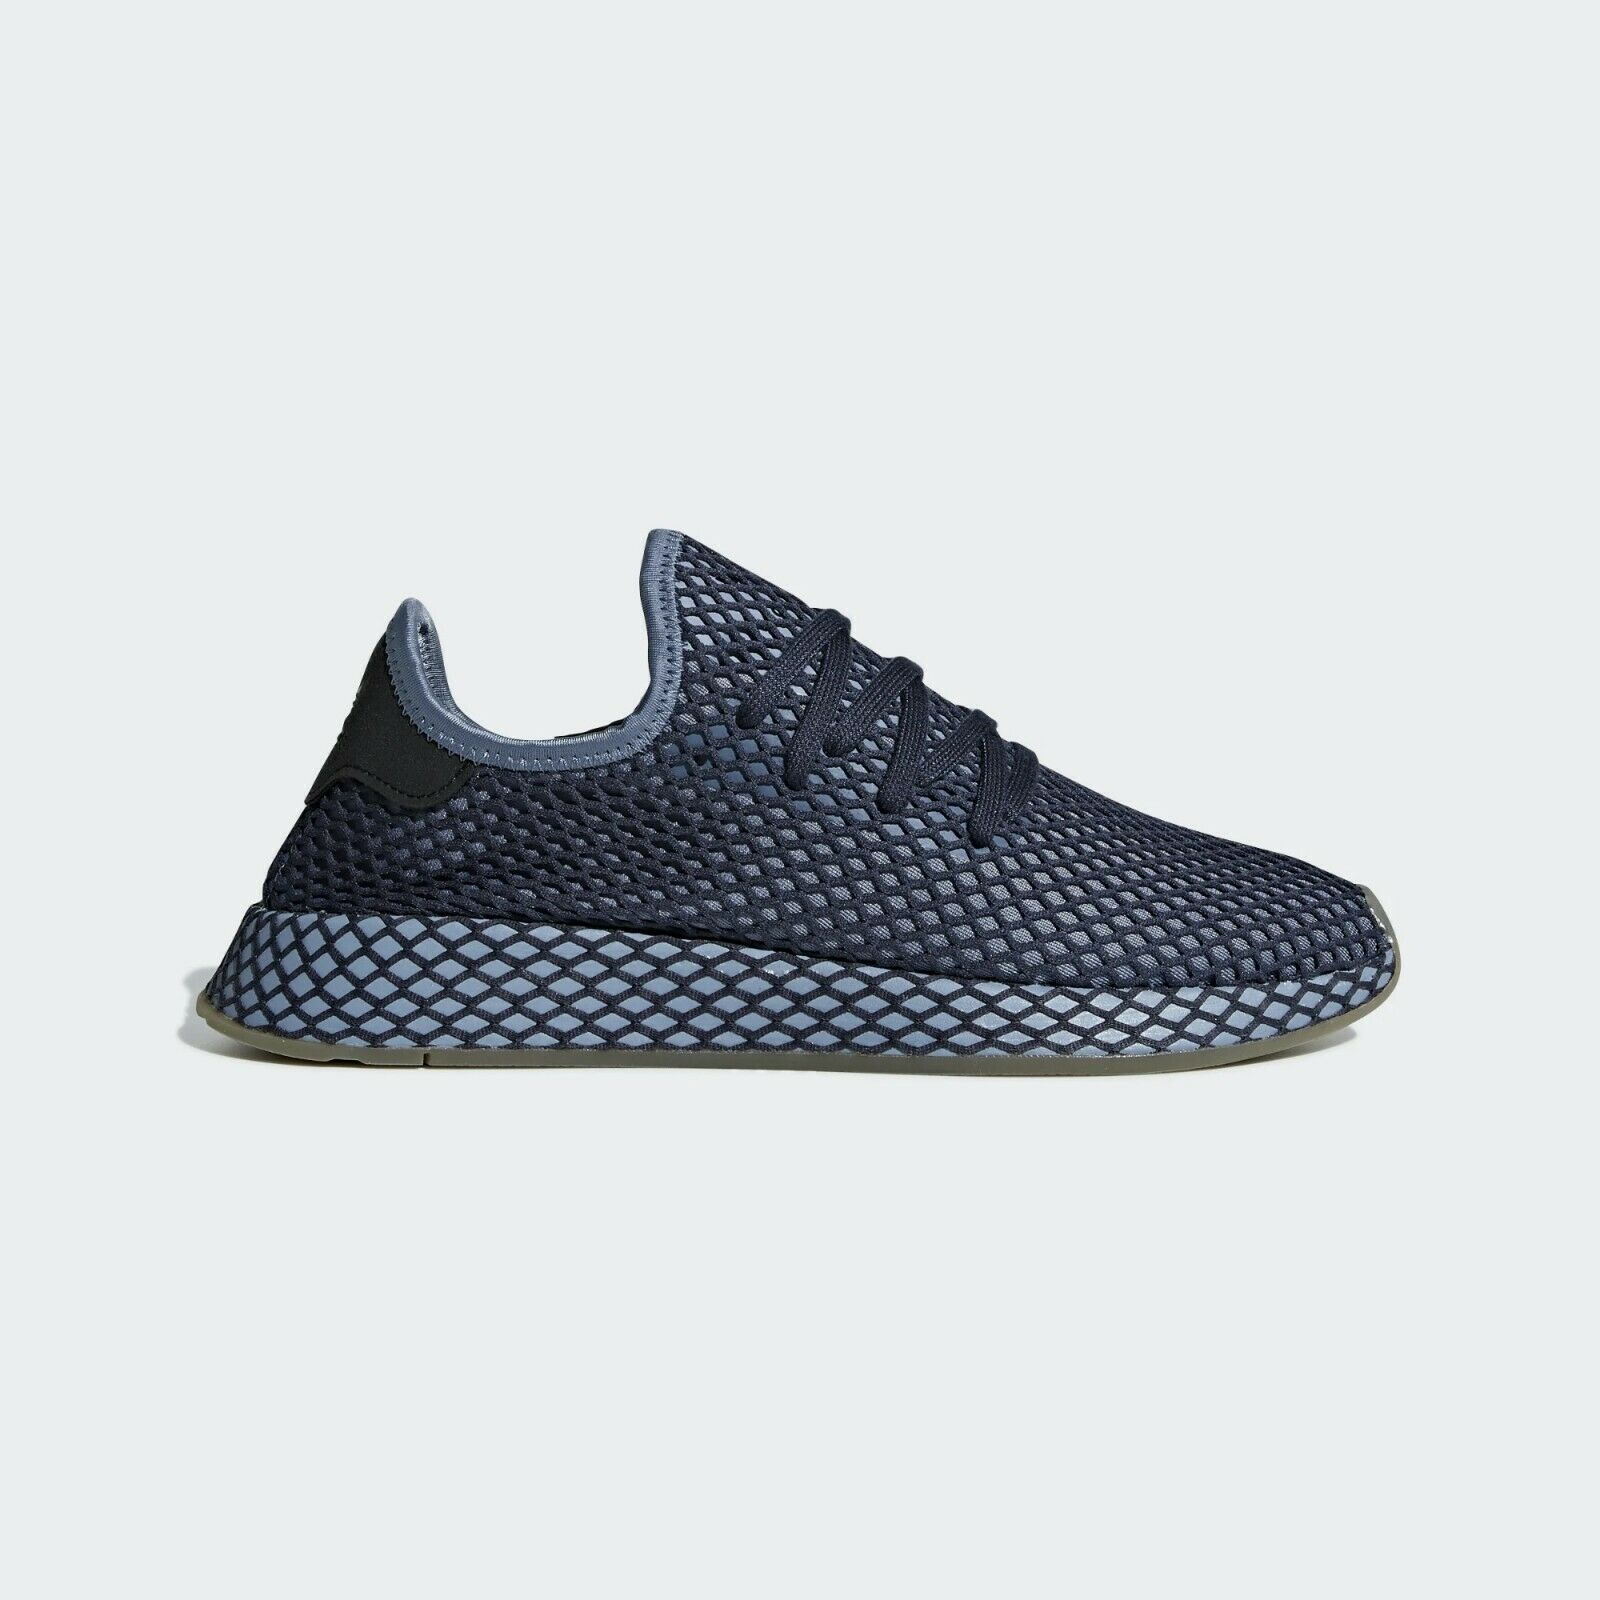 pretty nice 0ec02 11067 New Adidas Deerupt Running shoes B41772 US8.5-9.5 US8.5-9.5